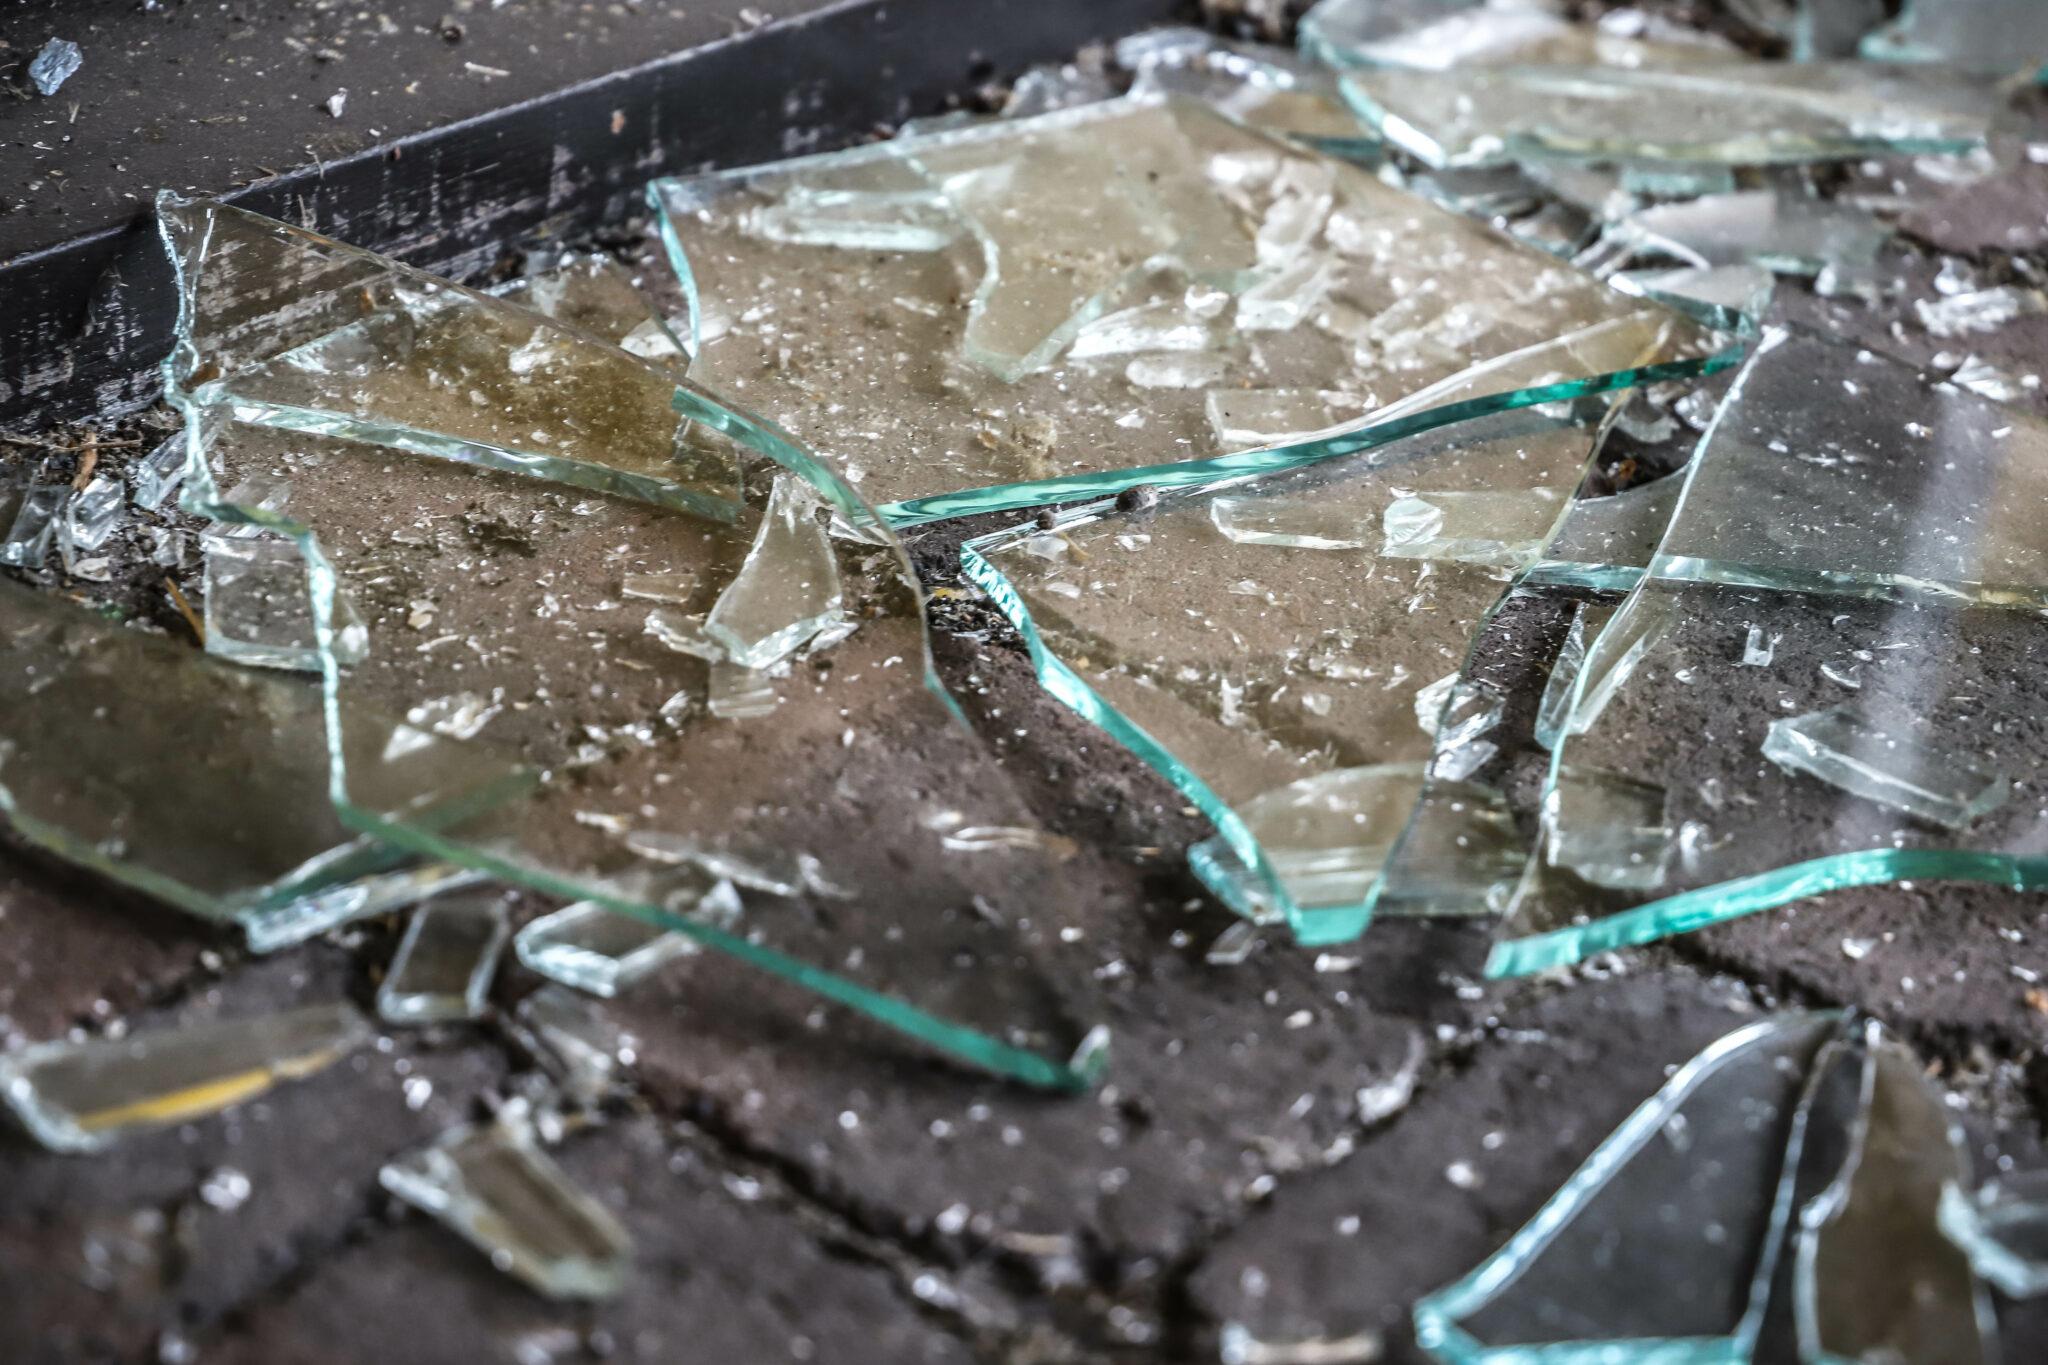 de spil bergse heide bergs zand park glas gebroken scherven